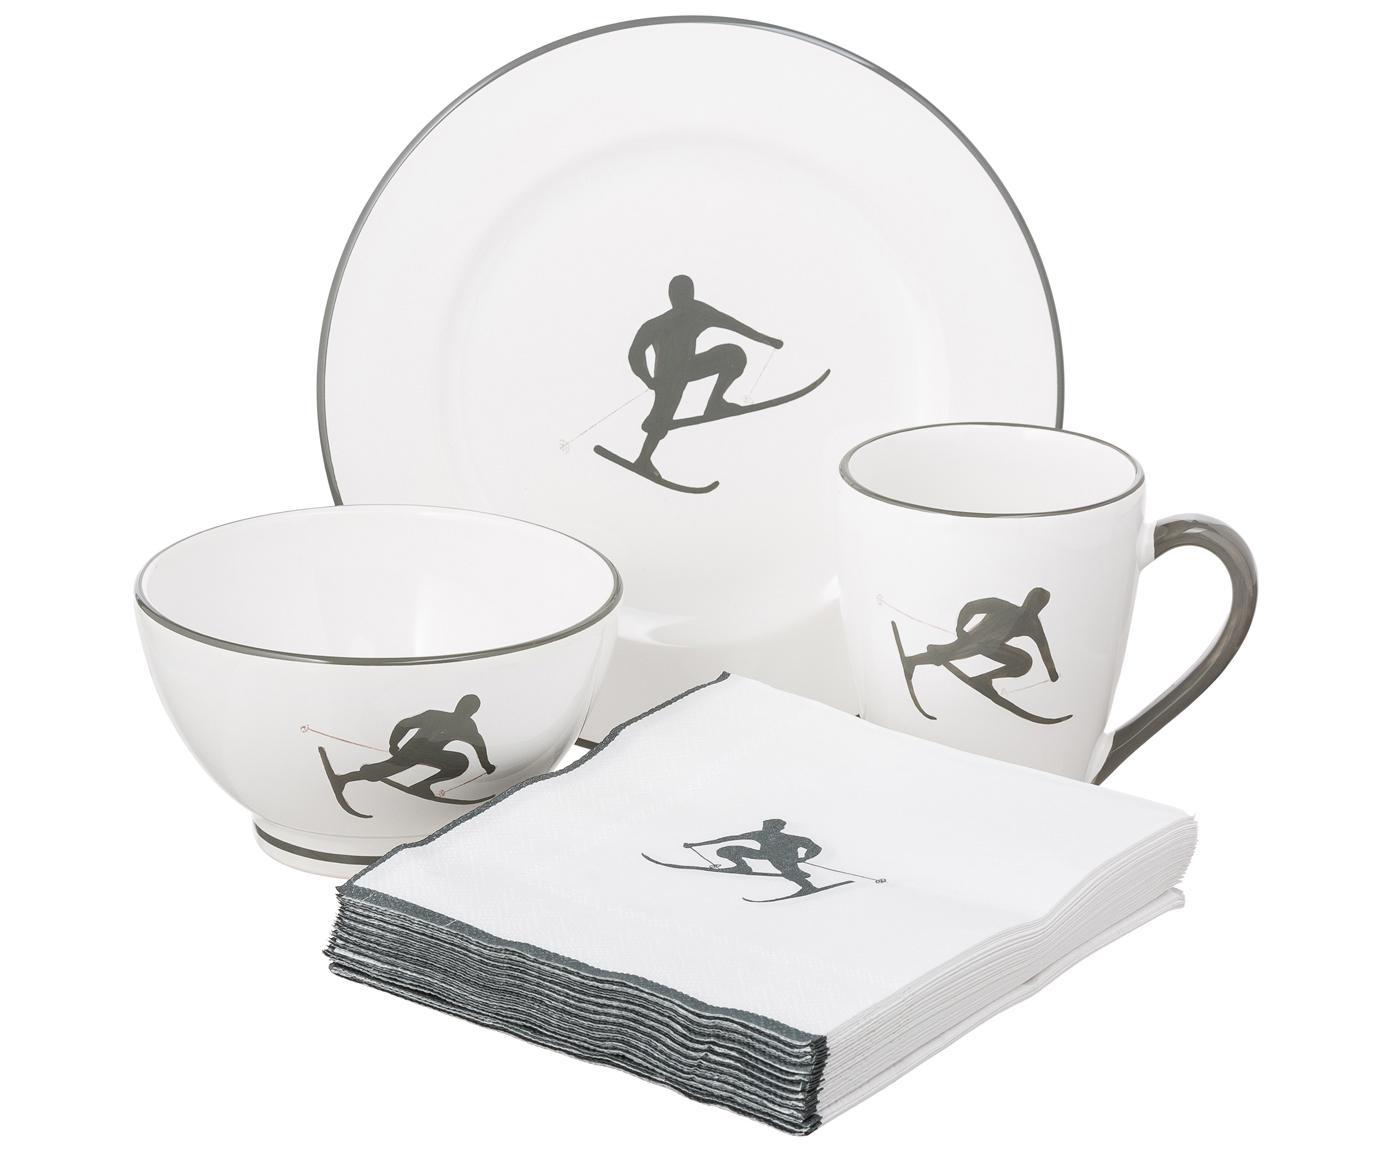 Handbemaltes Frühstücks-Set Toni, 4-tlg., Keramik, Grau, Weiß, Sondergrößen